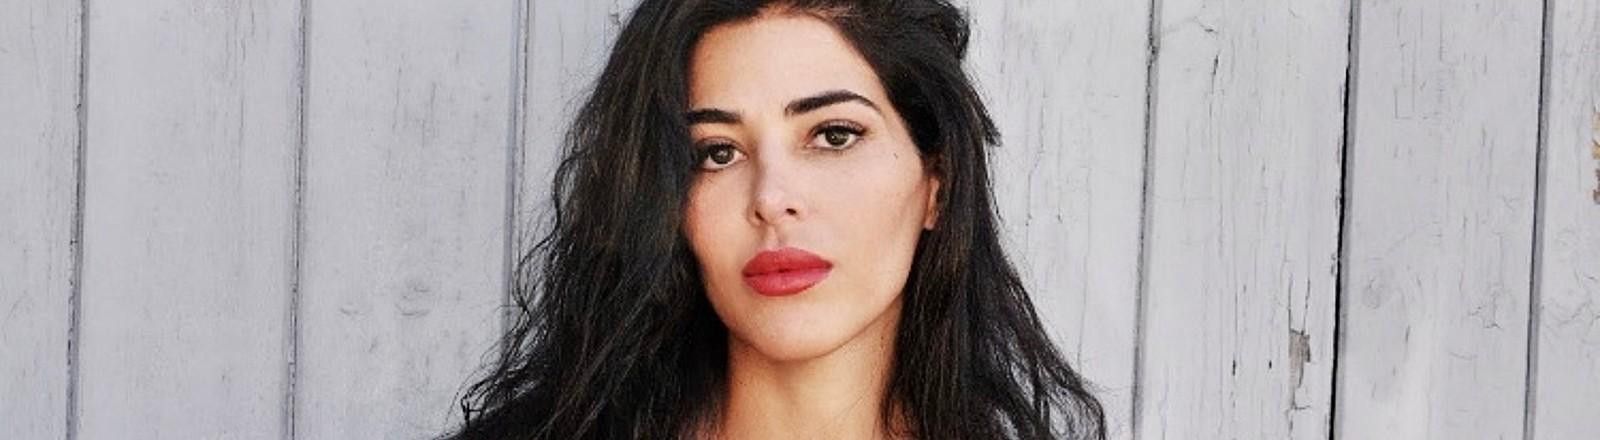 Samira El Ouassil im Portrait.